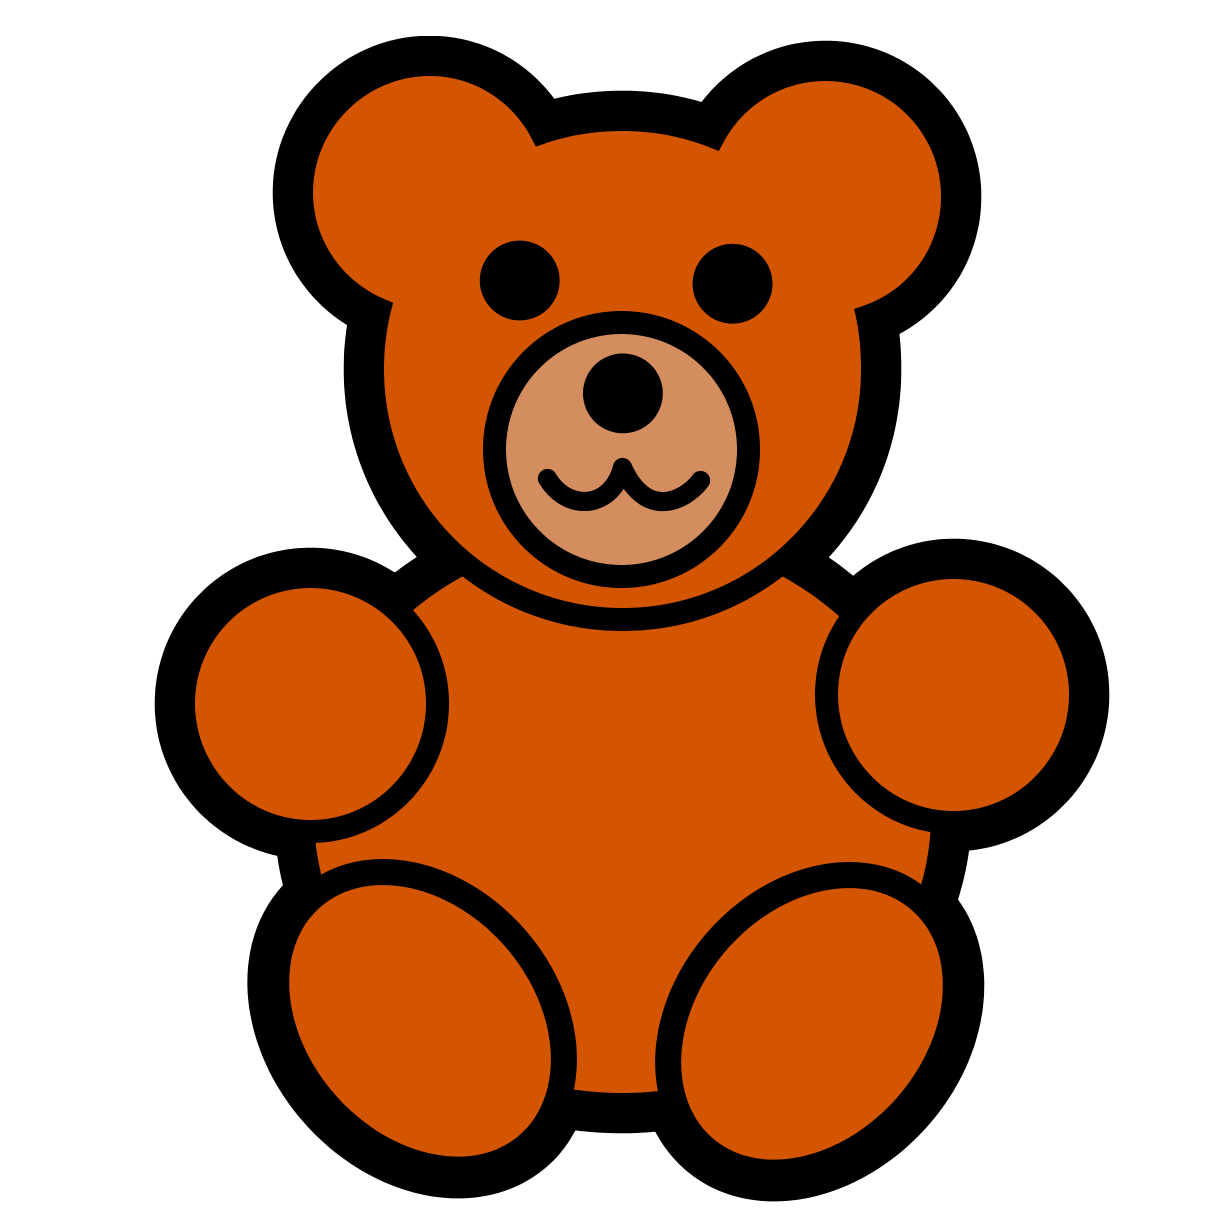 Teddy clipart Clipart Clip Teddy Teddy Clipart